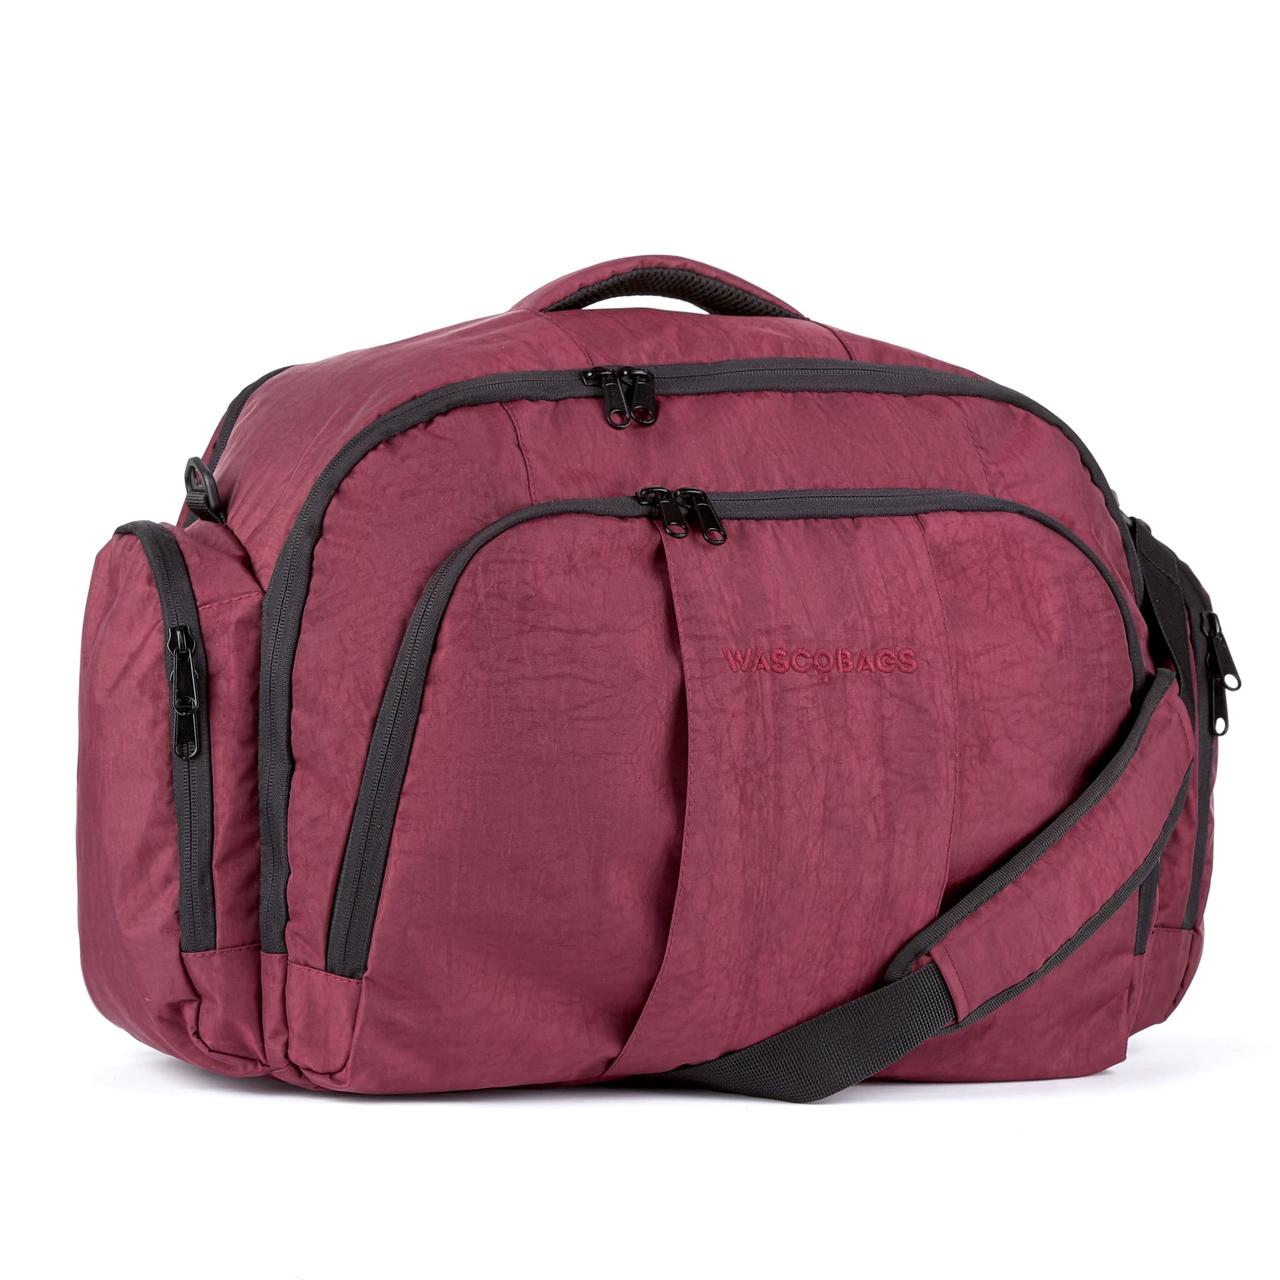 Дорожная сумка Wascobags Atlantic 55х35х20 Bordo (39 L), ручная кладь